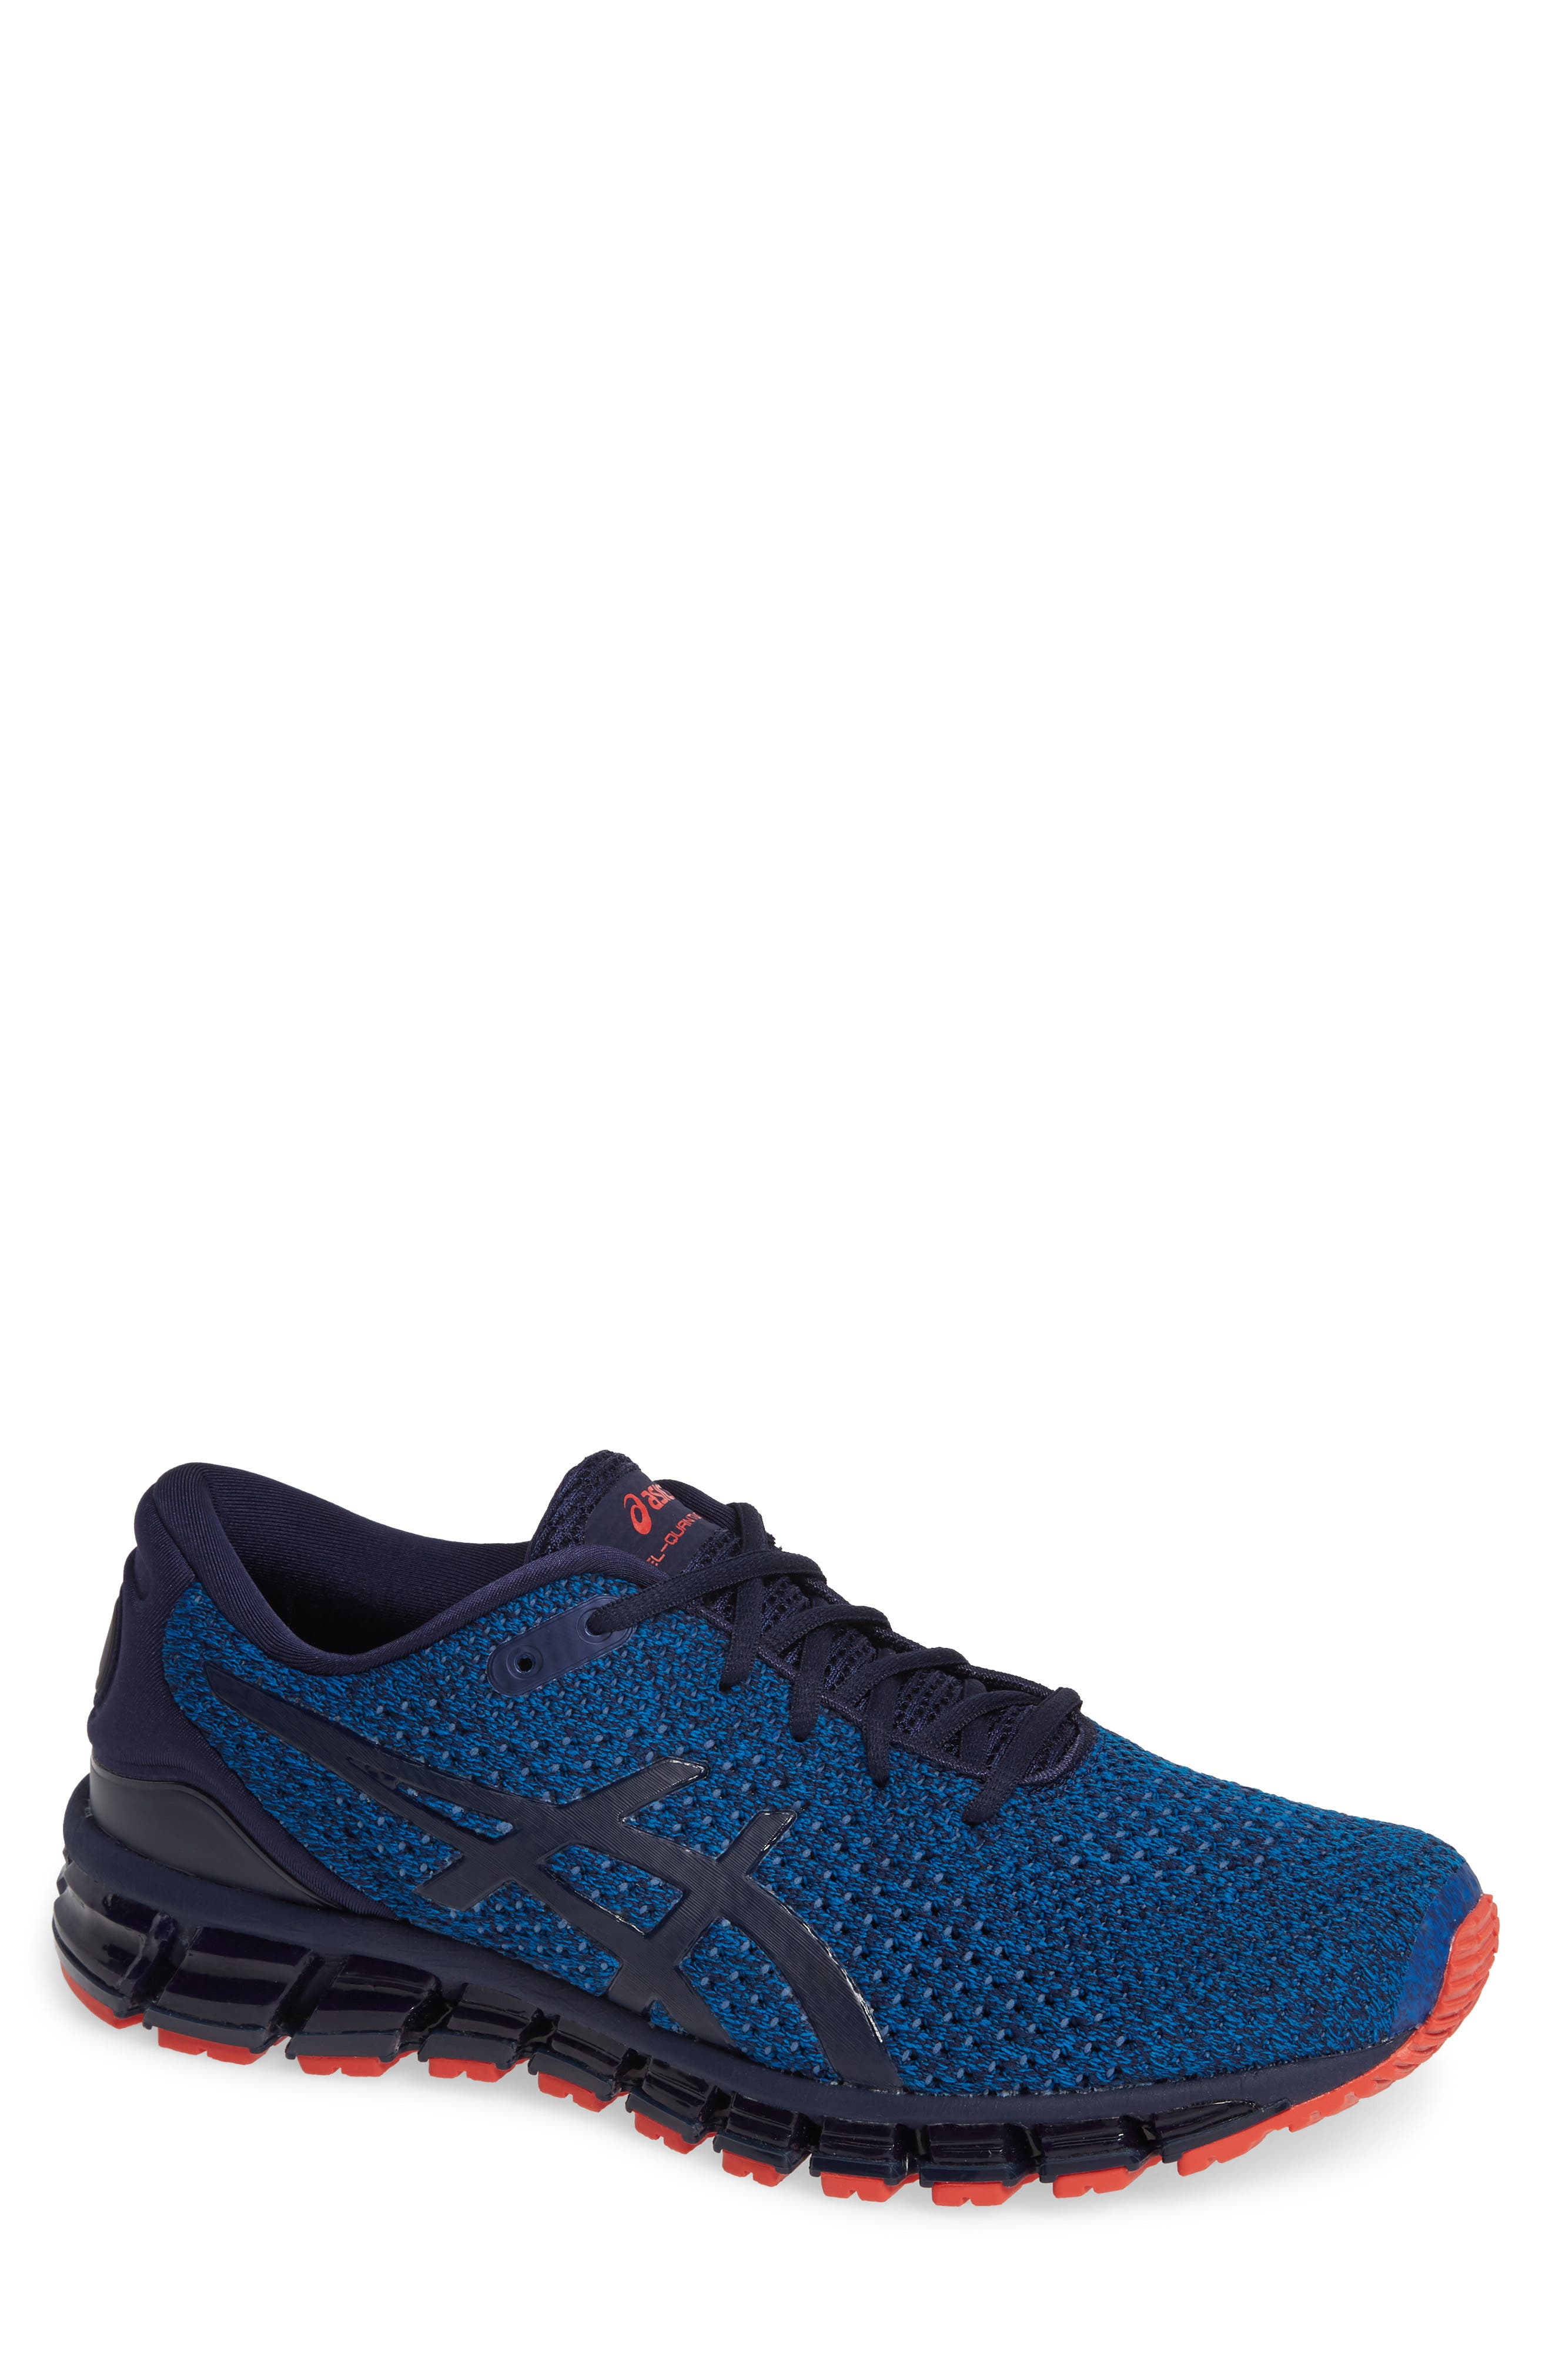 GEL-Quantum 360 Running Shoe,                         Main,                         color, RACE BLUE